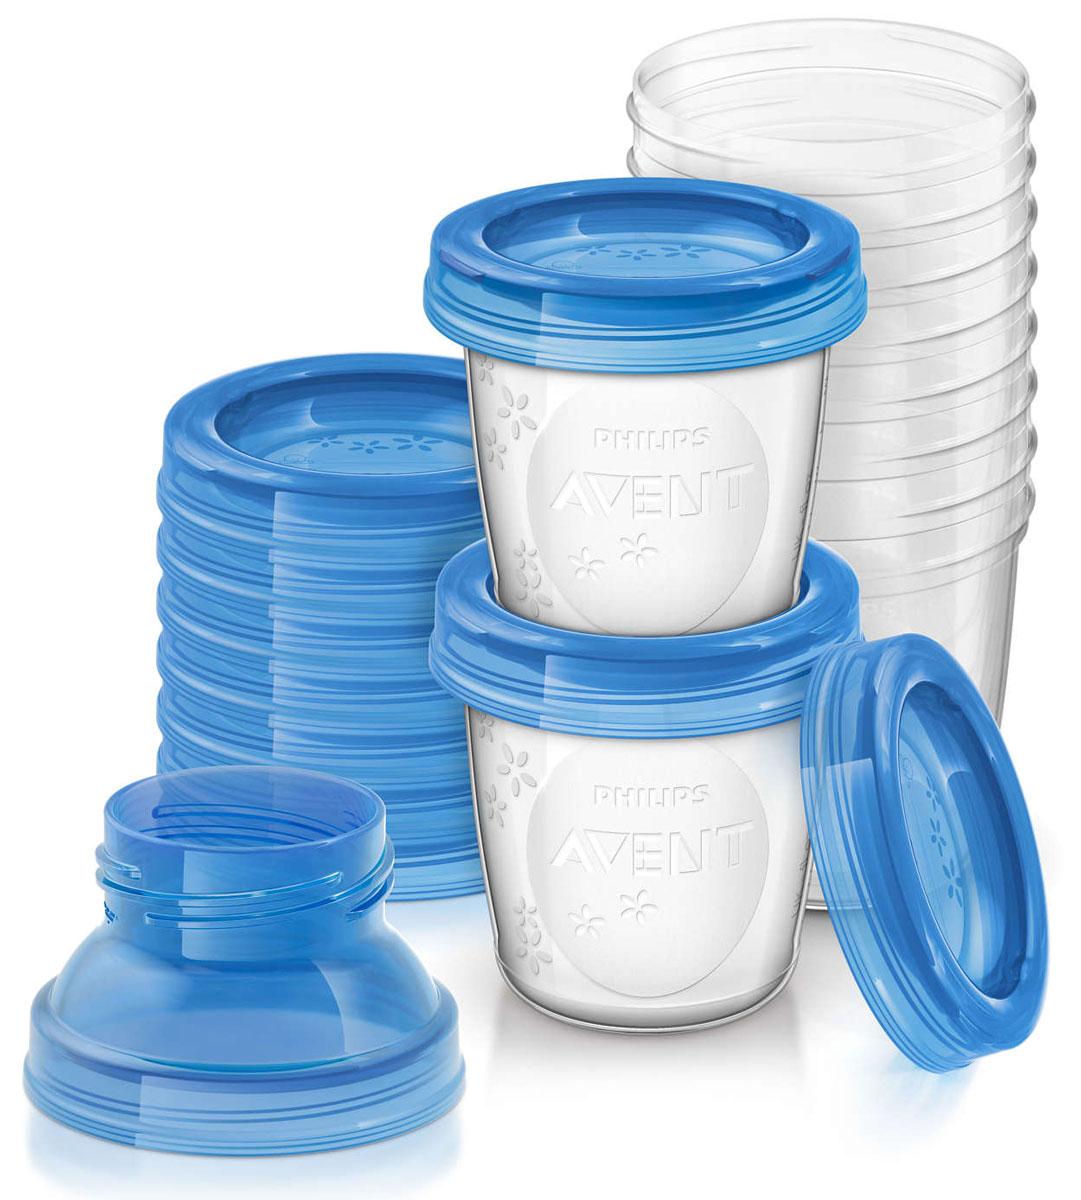 Philips Avent Контейнеры для хранения грудного молока SCF618/10 philips avent контейнеры с крышками для хранения питания 5 шт 180 мл philips avent